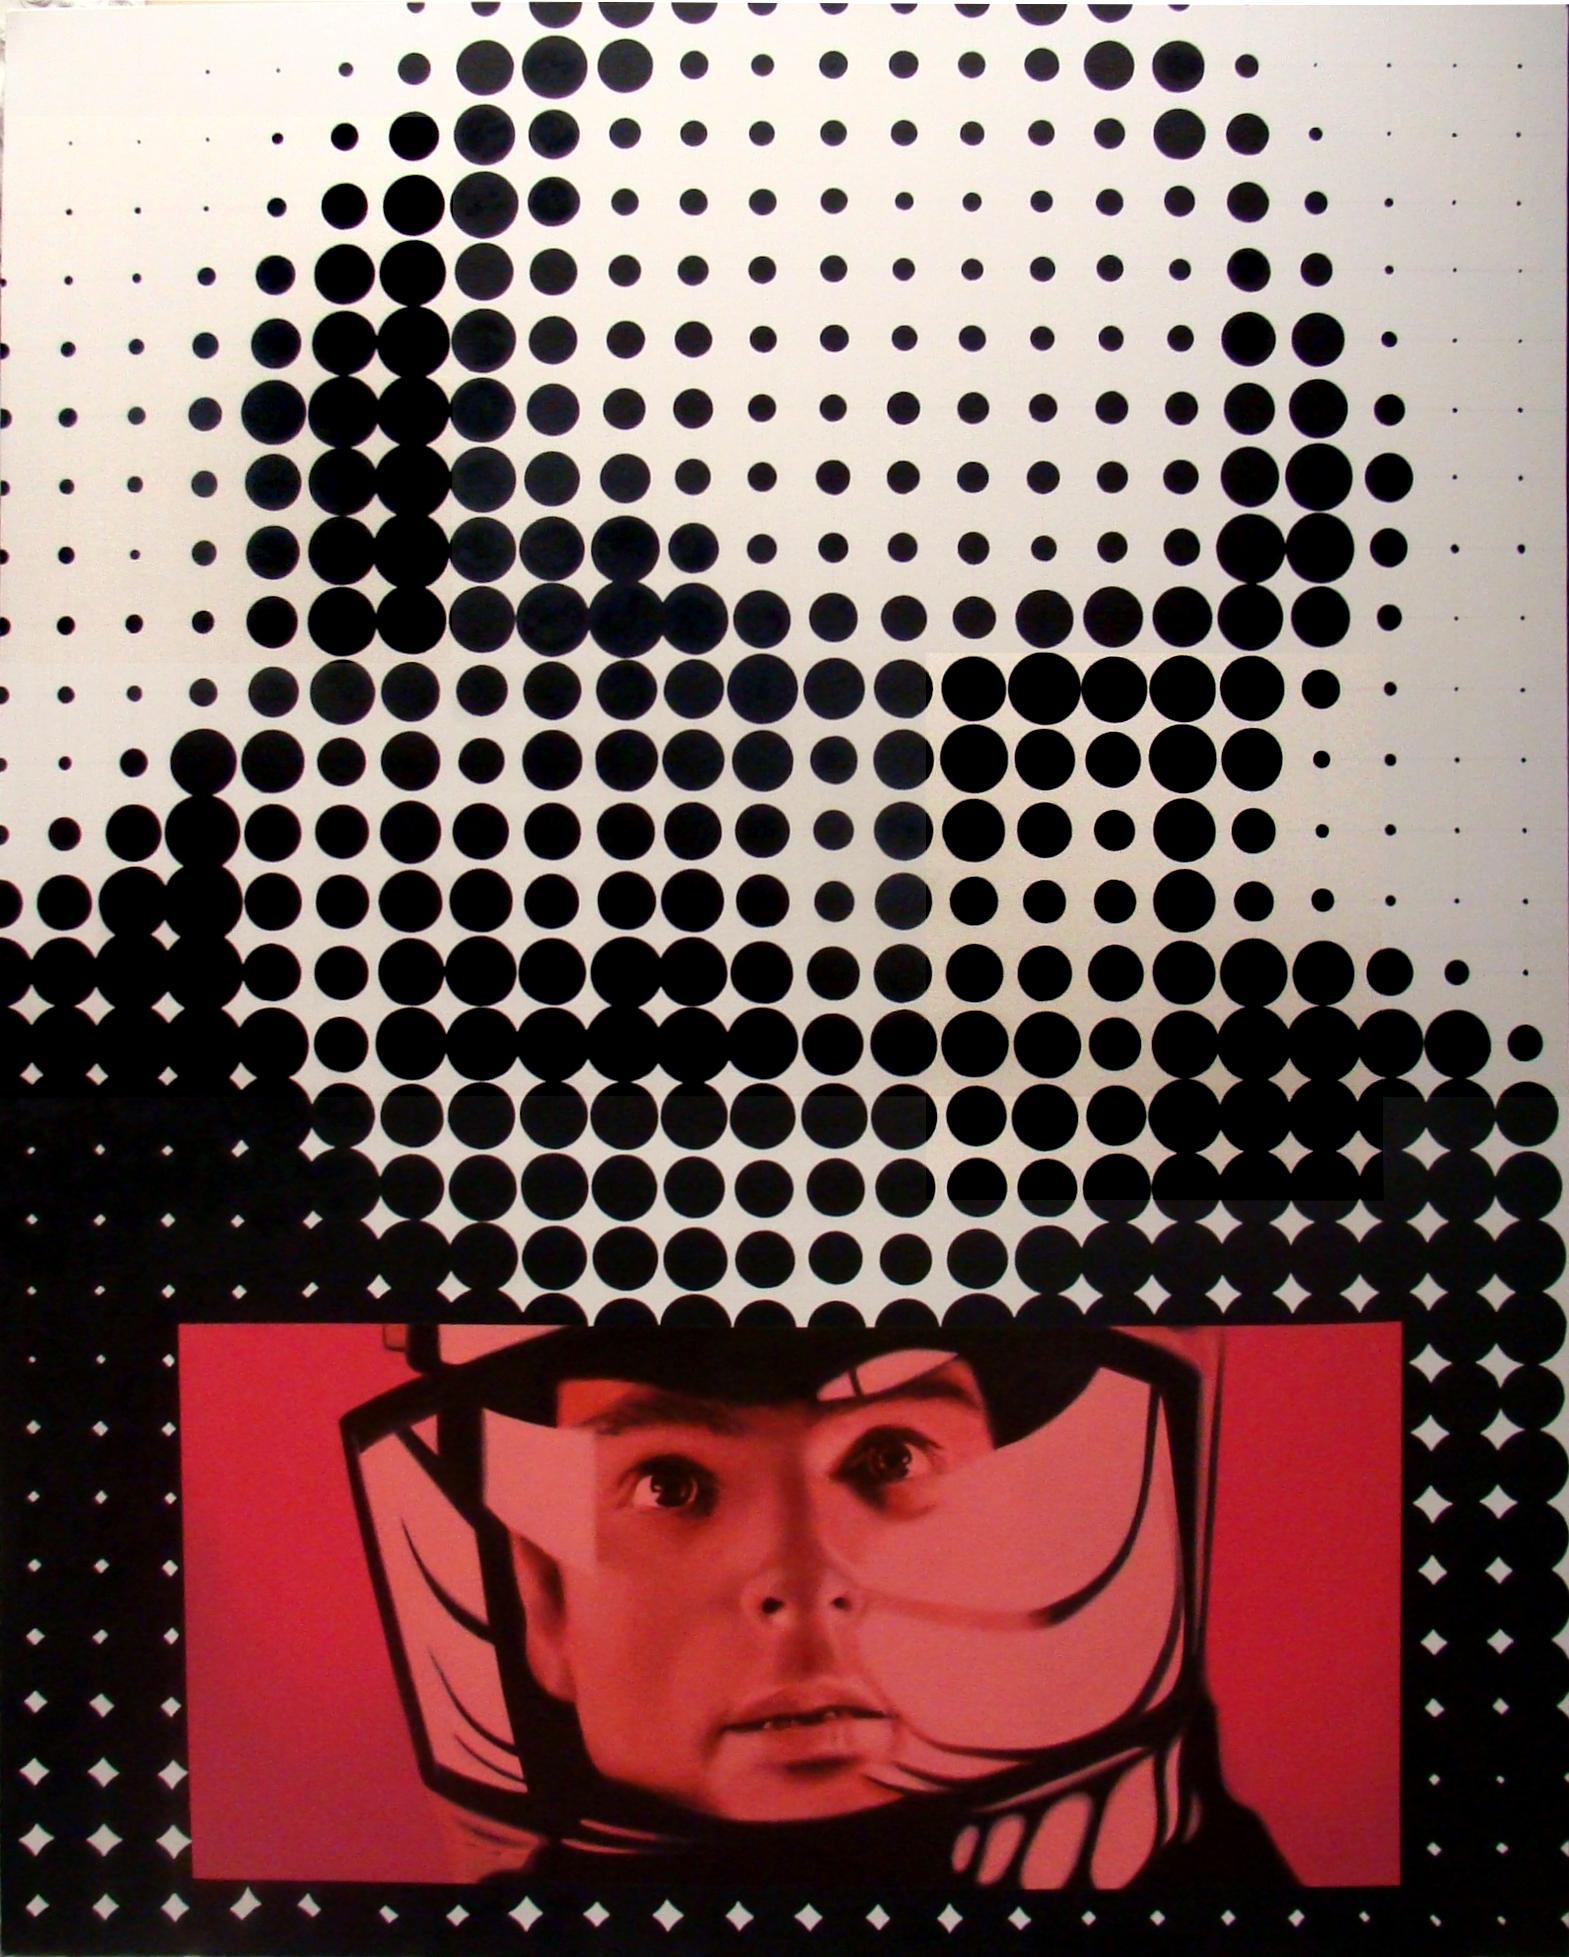 cubrick-oleo sobre tela-170x130cm. 2008.jpg